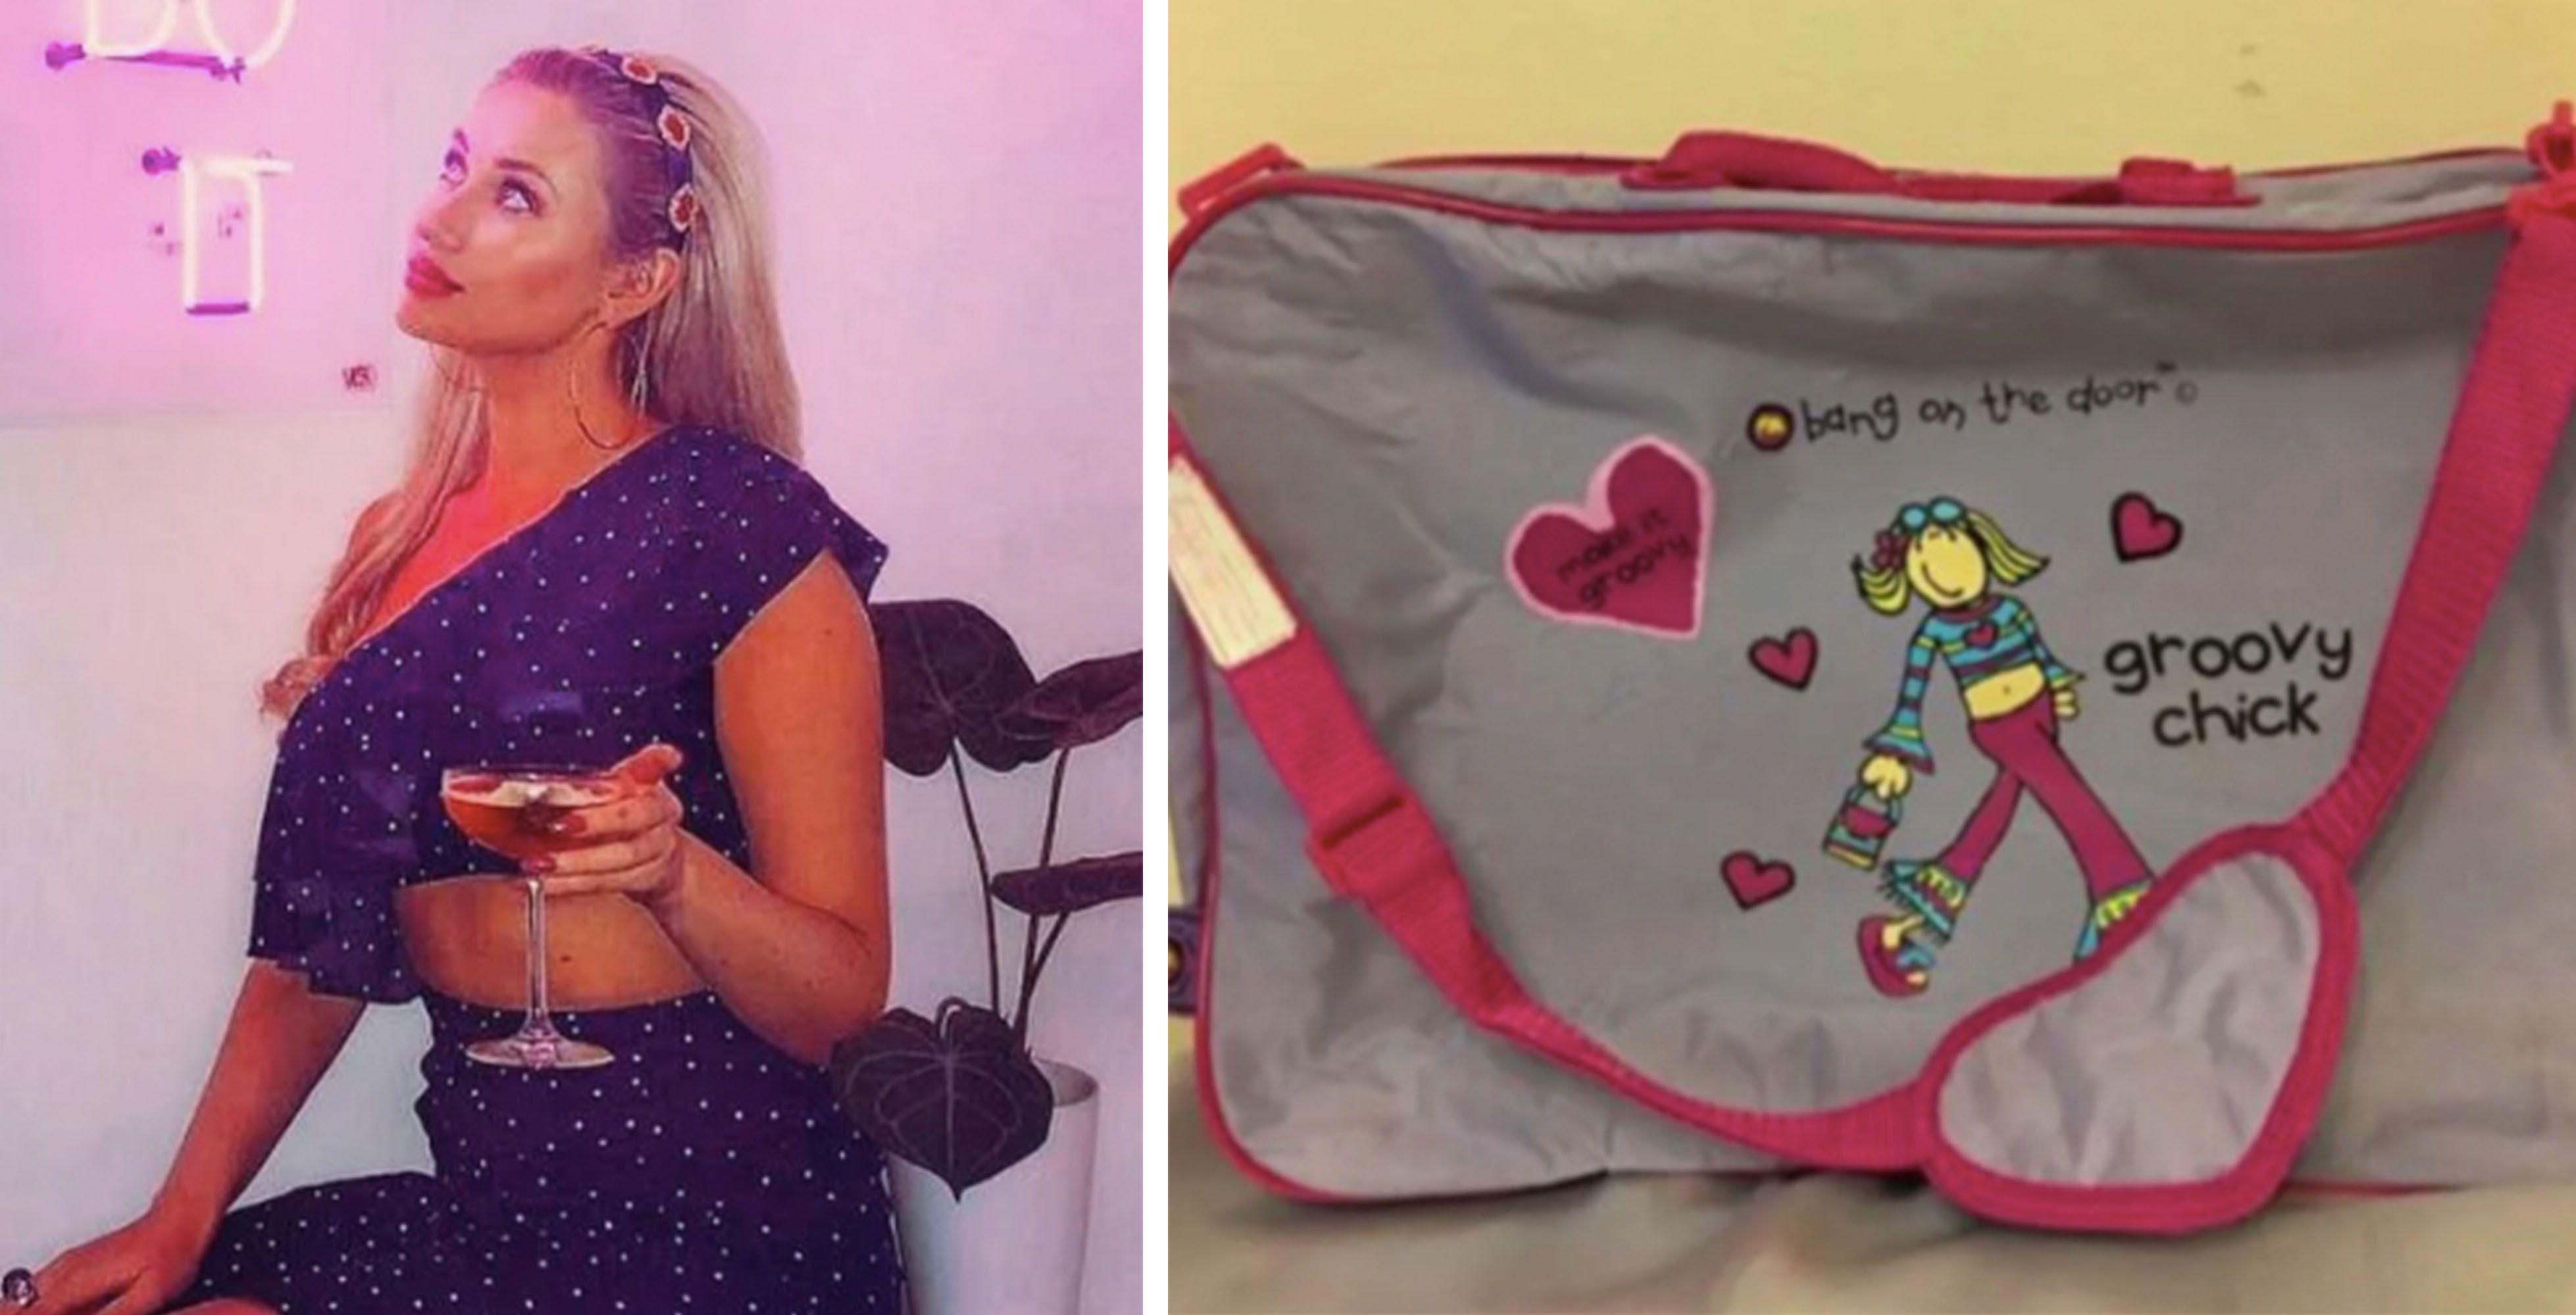 Image may contain: Purse, Clothing, Apparel, Accessory, Handbag, Accessories, Bag, Person, Human